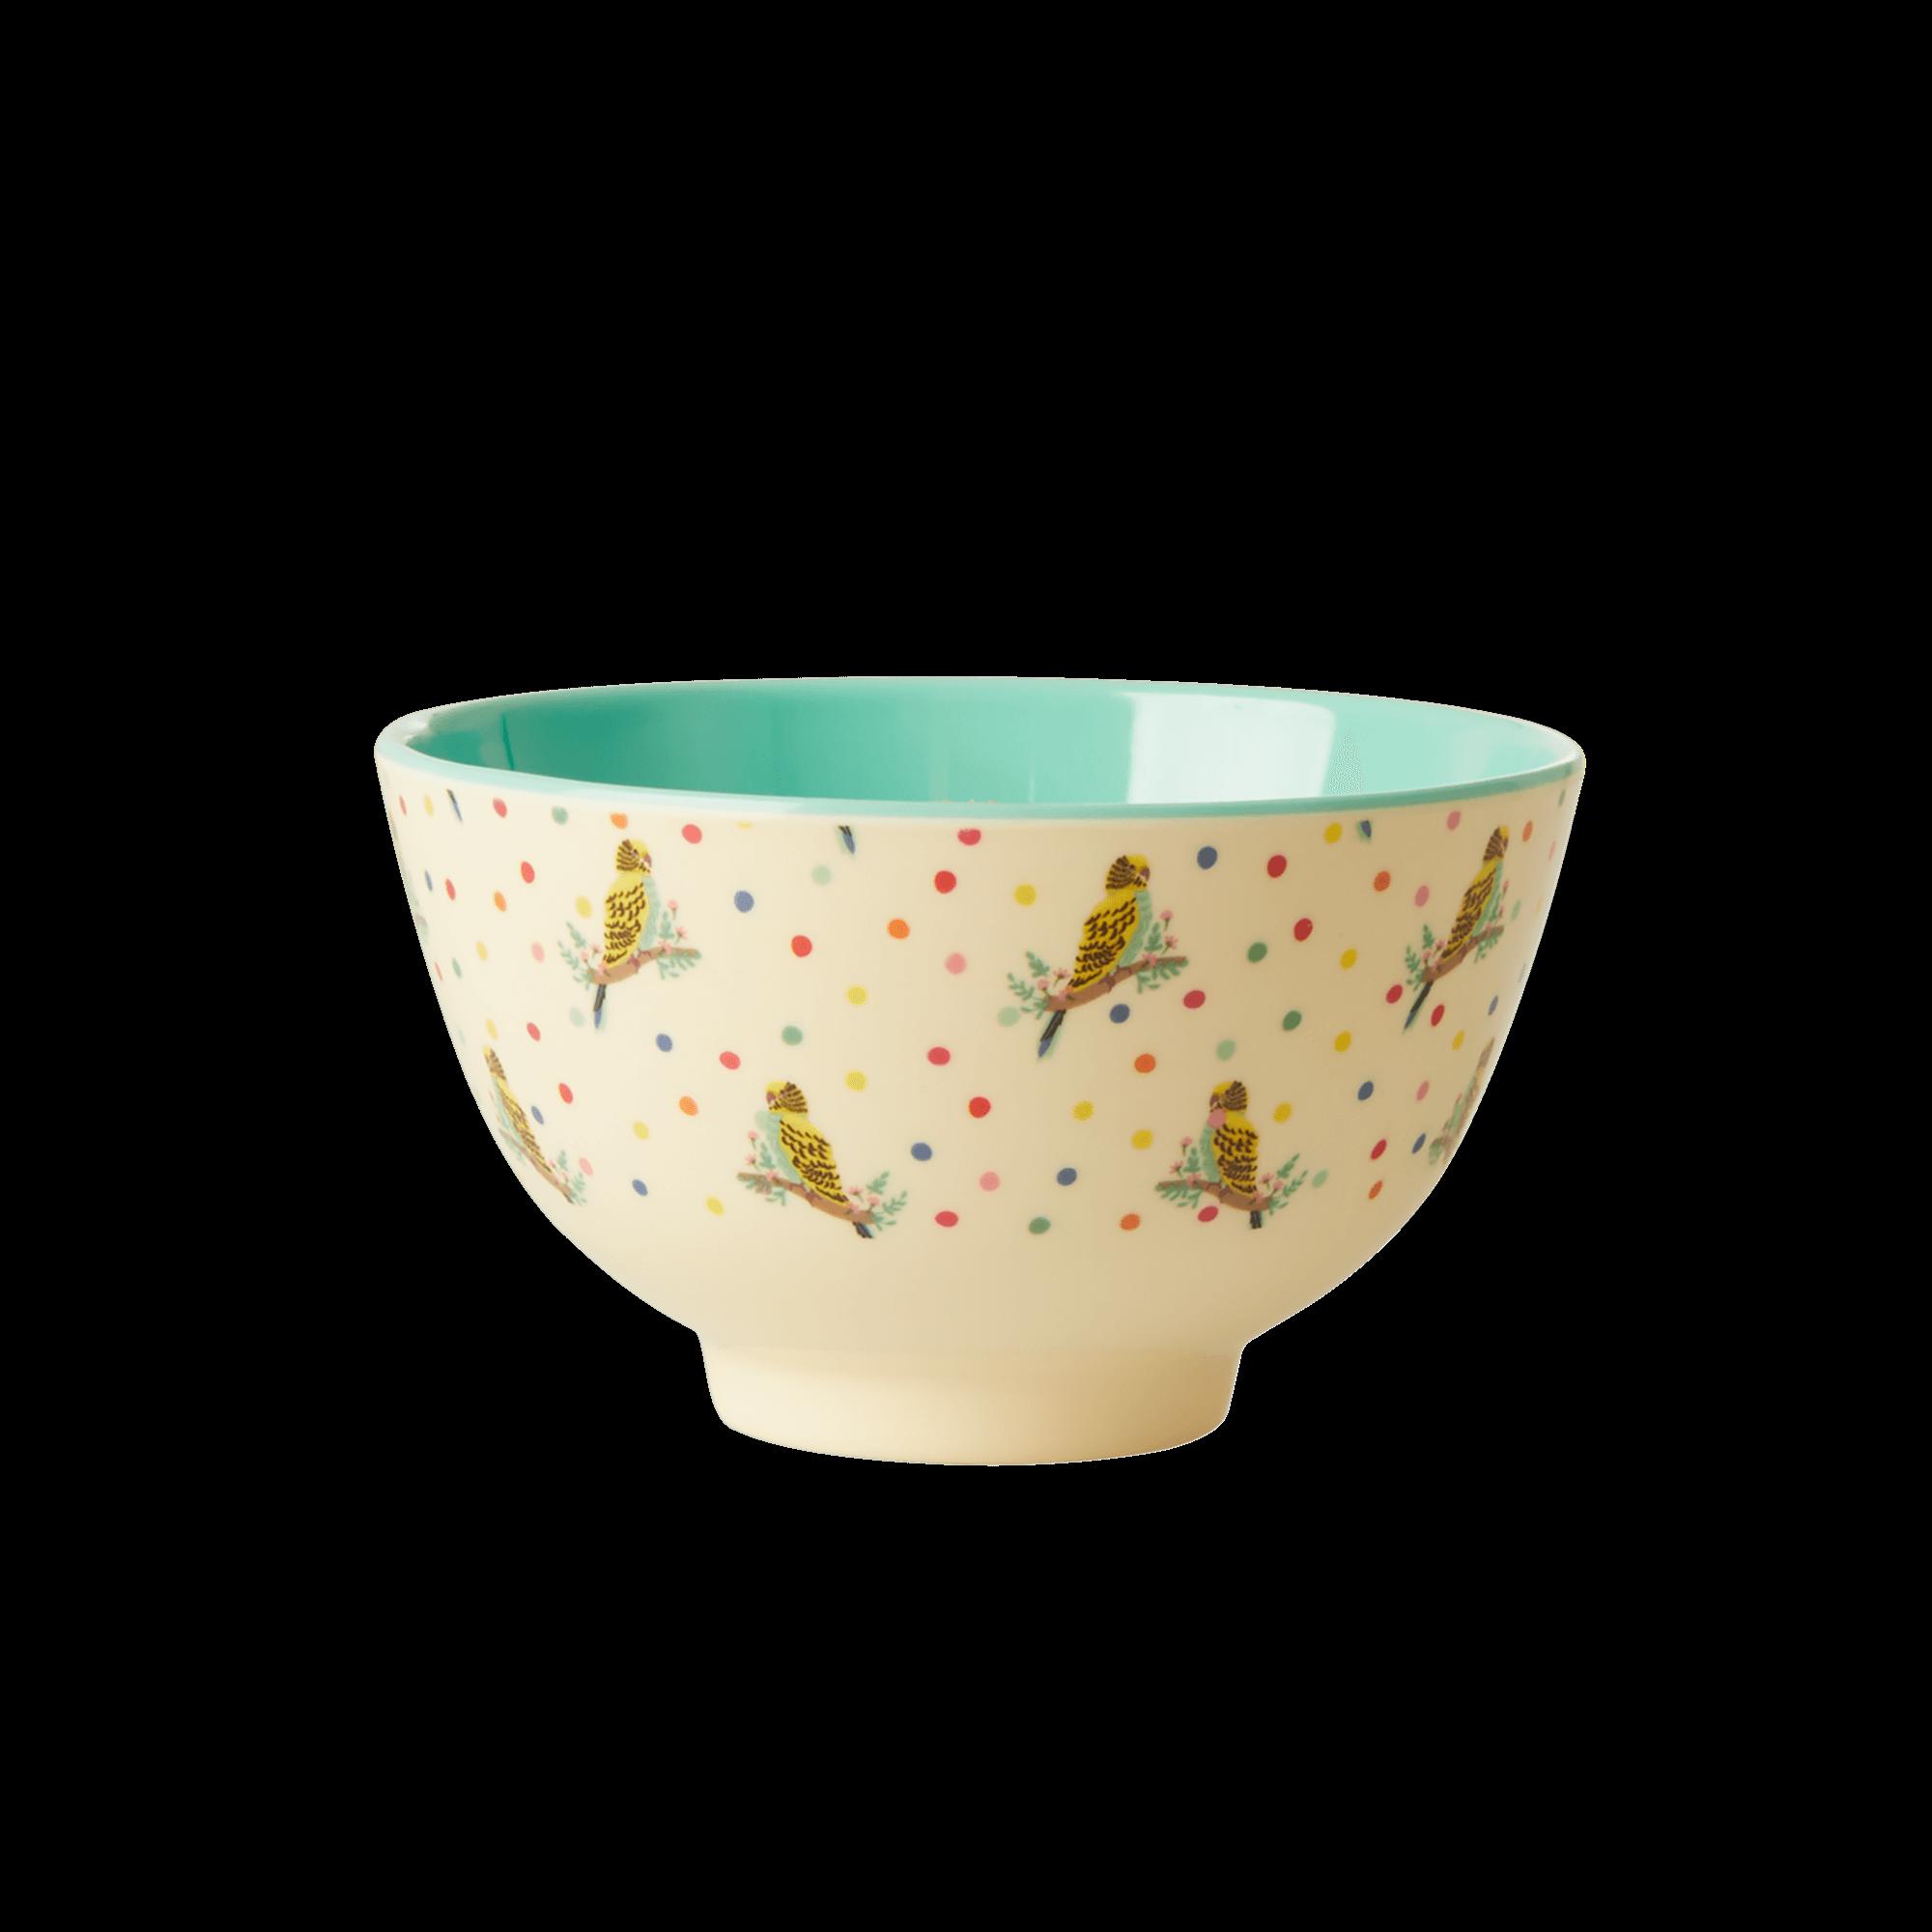 MELBW-SBUD_bol-rice-vaisselle-petit-d-homme-valenciennes